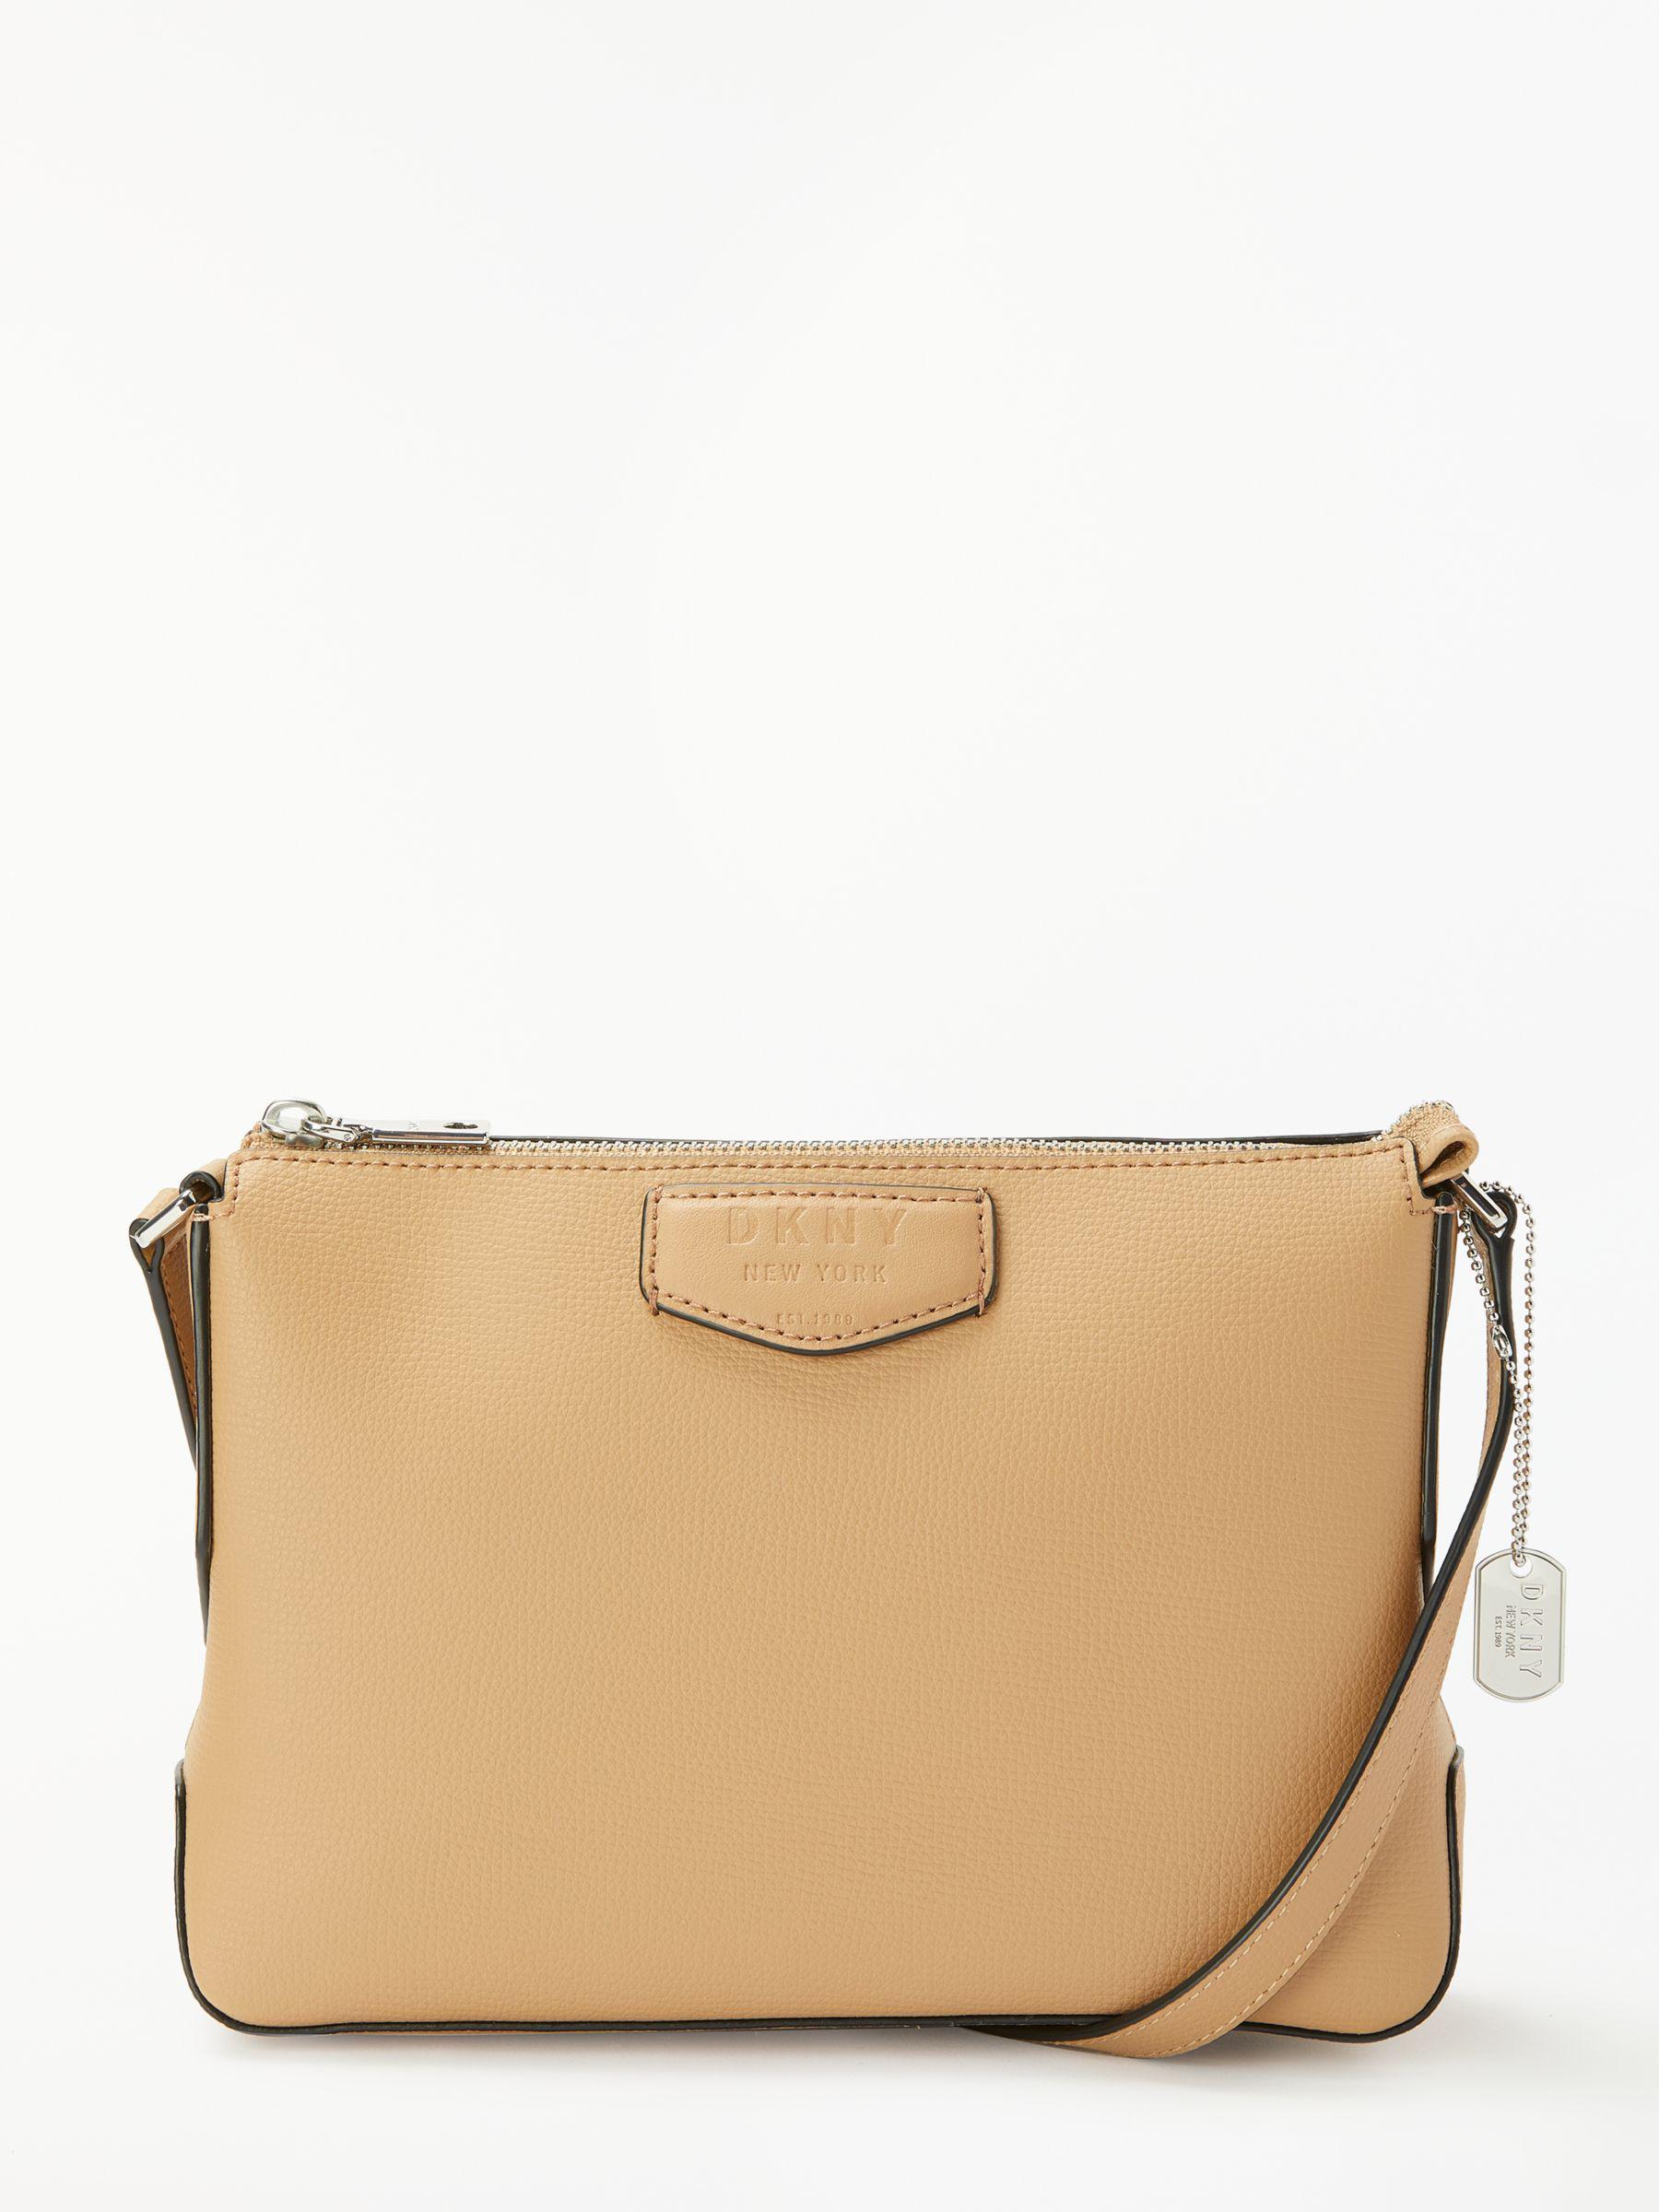 986e0992e DKNY Sullivan Top Zip Cross Body Bag - Lyst